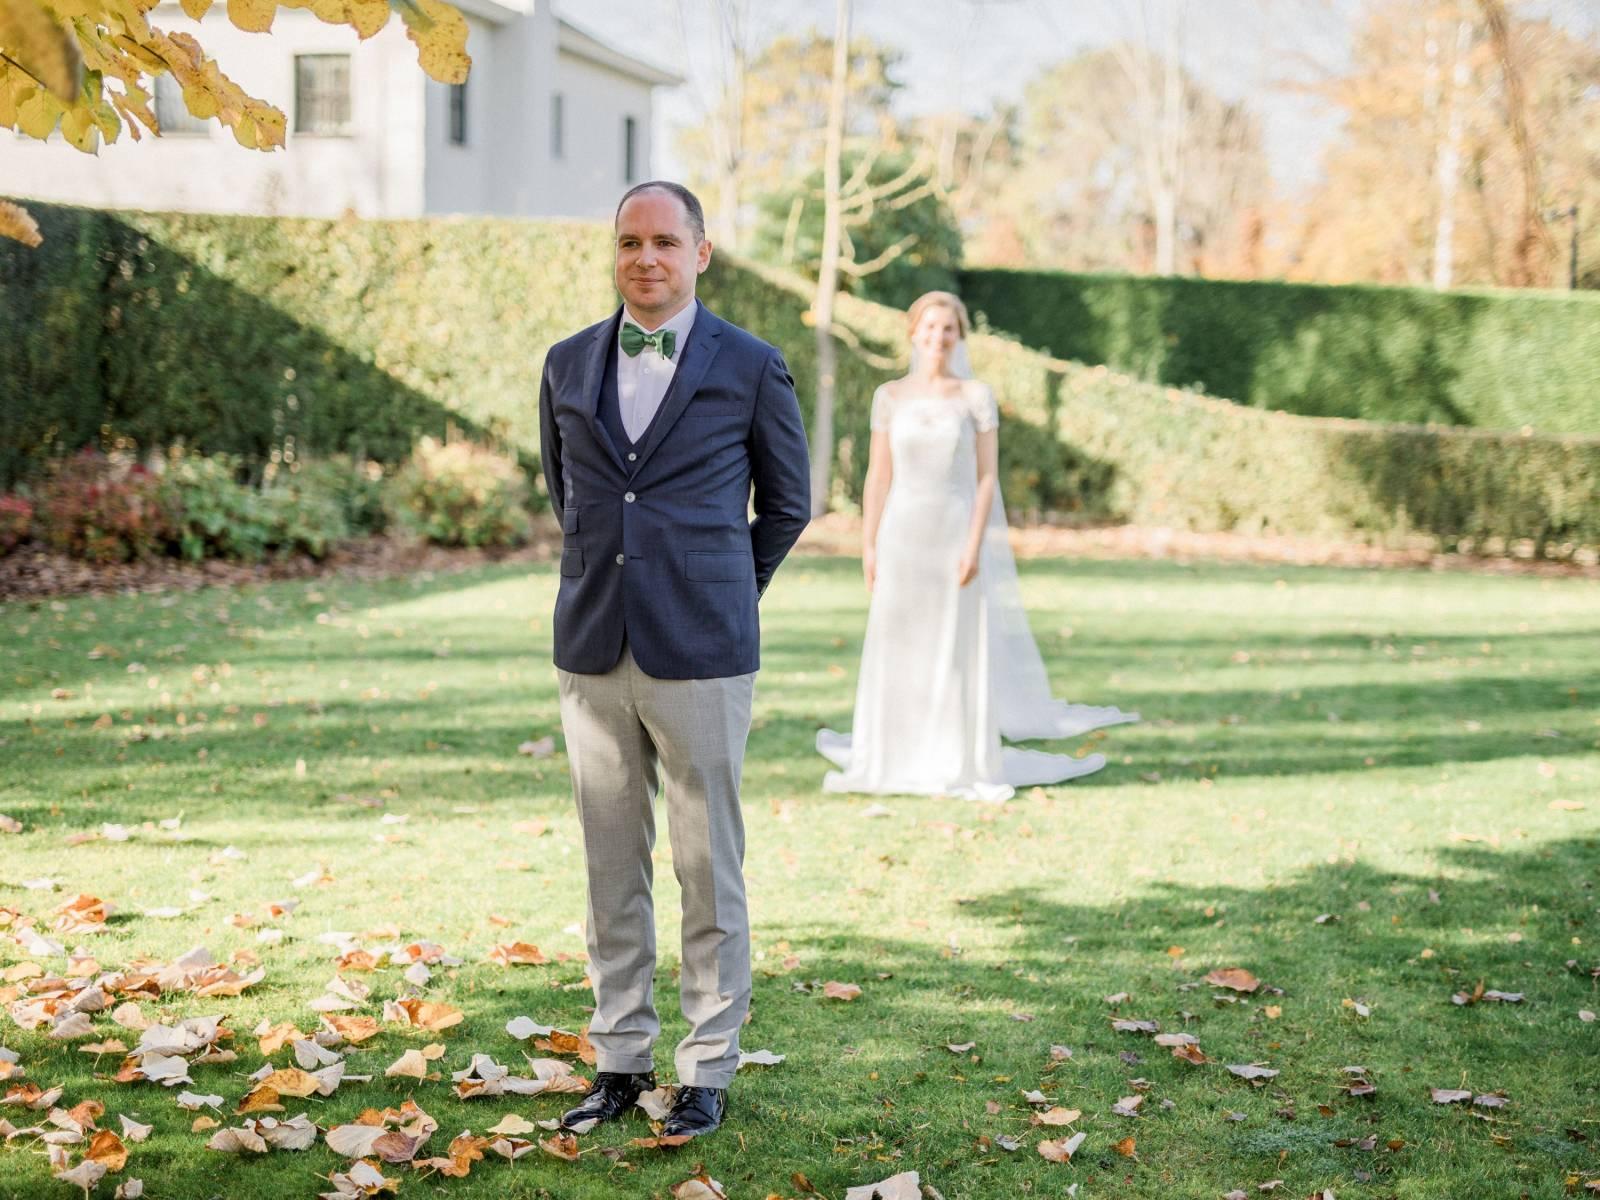 Elisabeth Van Lent Fine Art Wedding Photography - Ferme de Balingue wedding-3